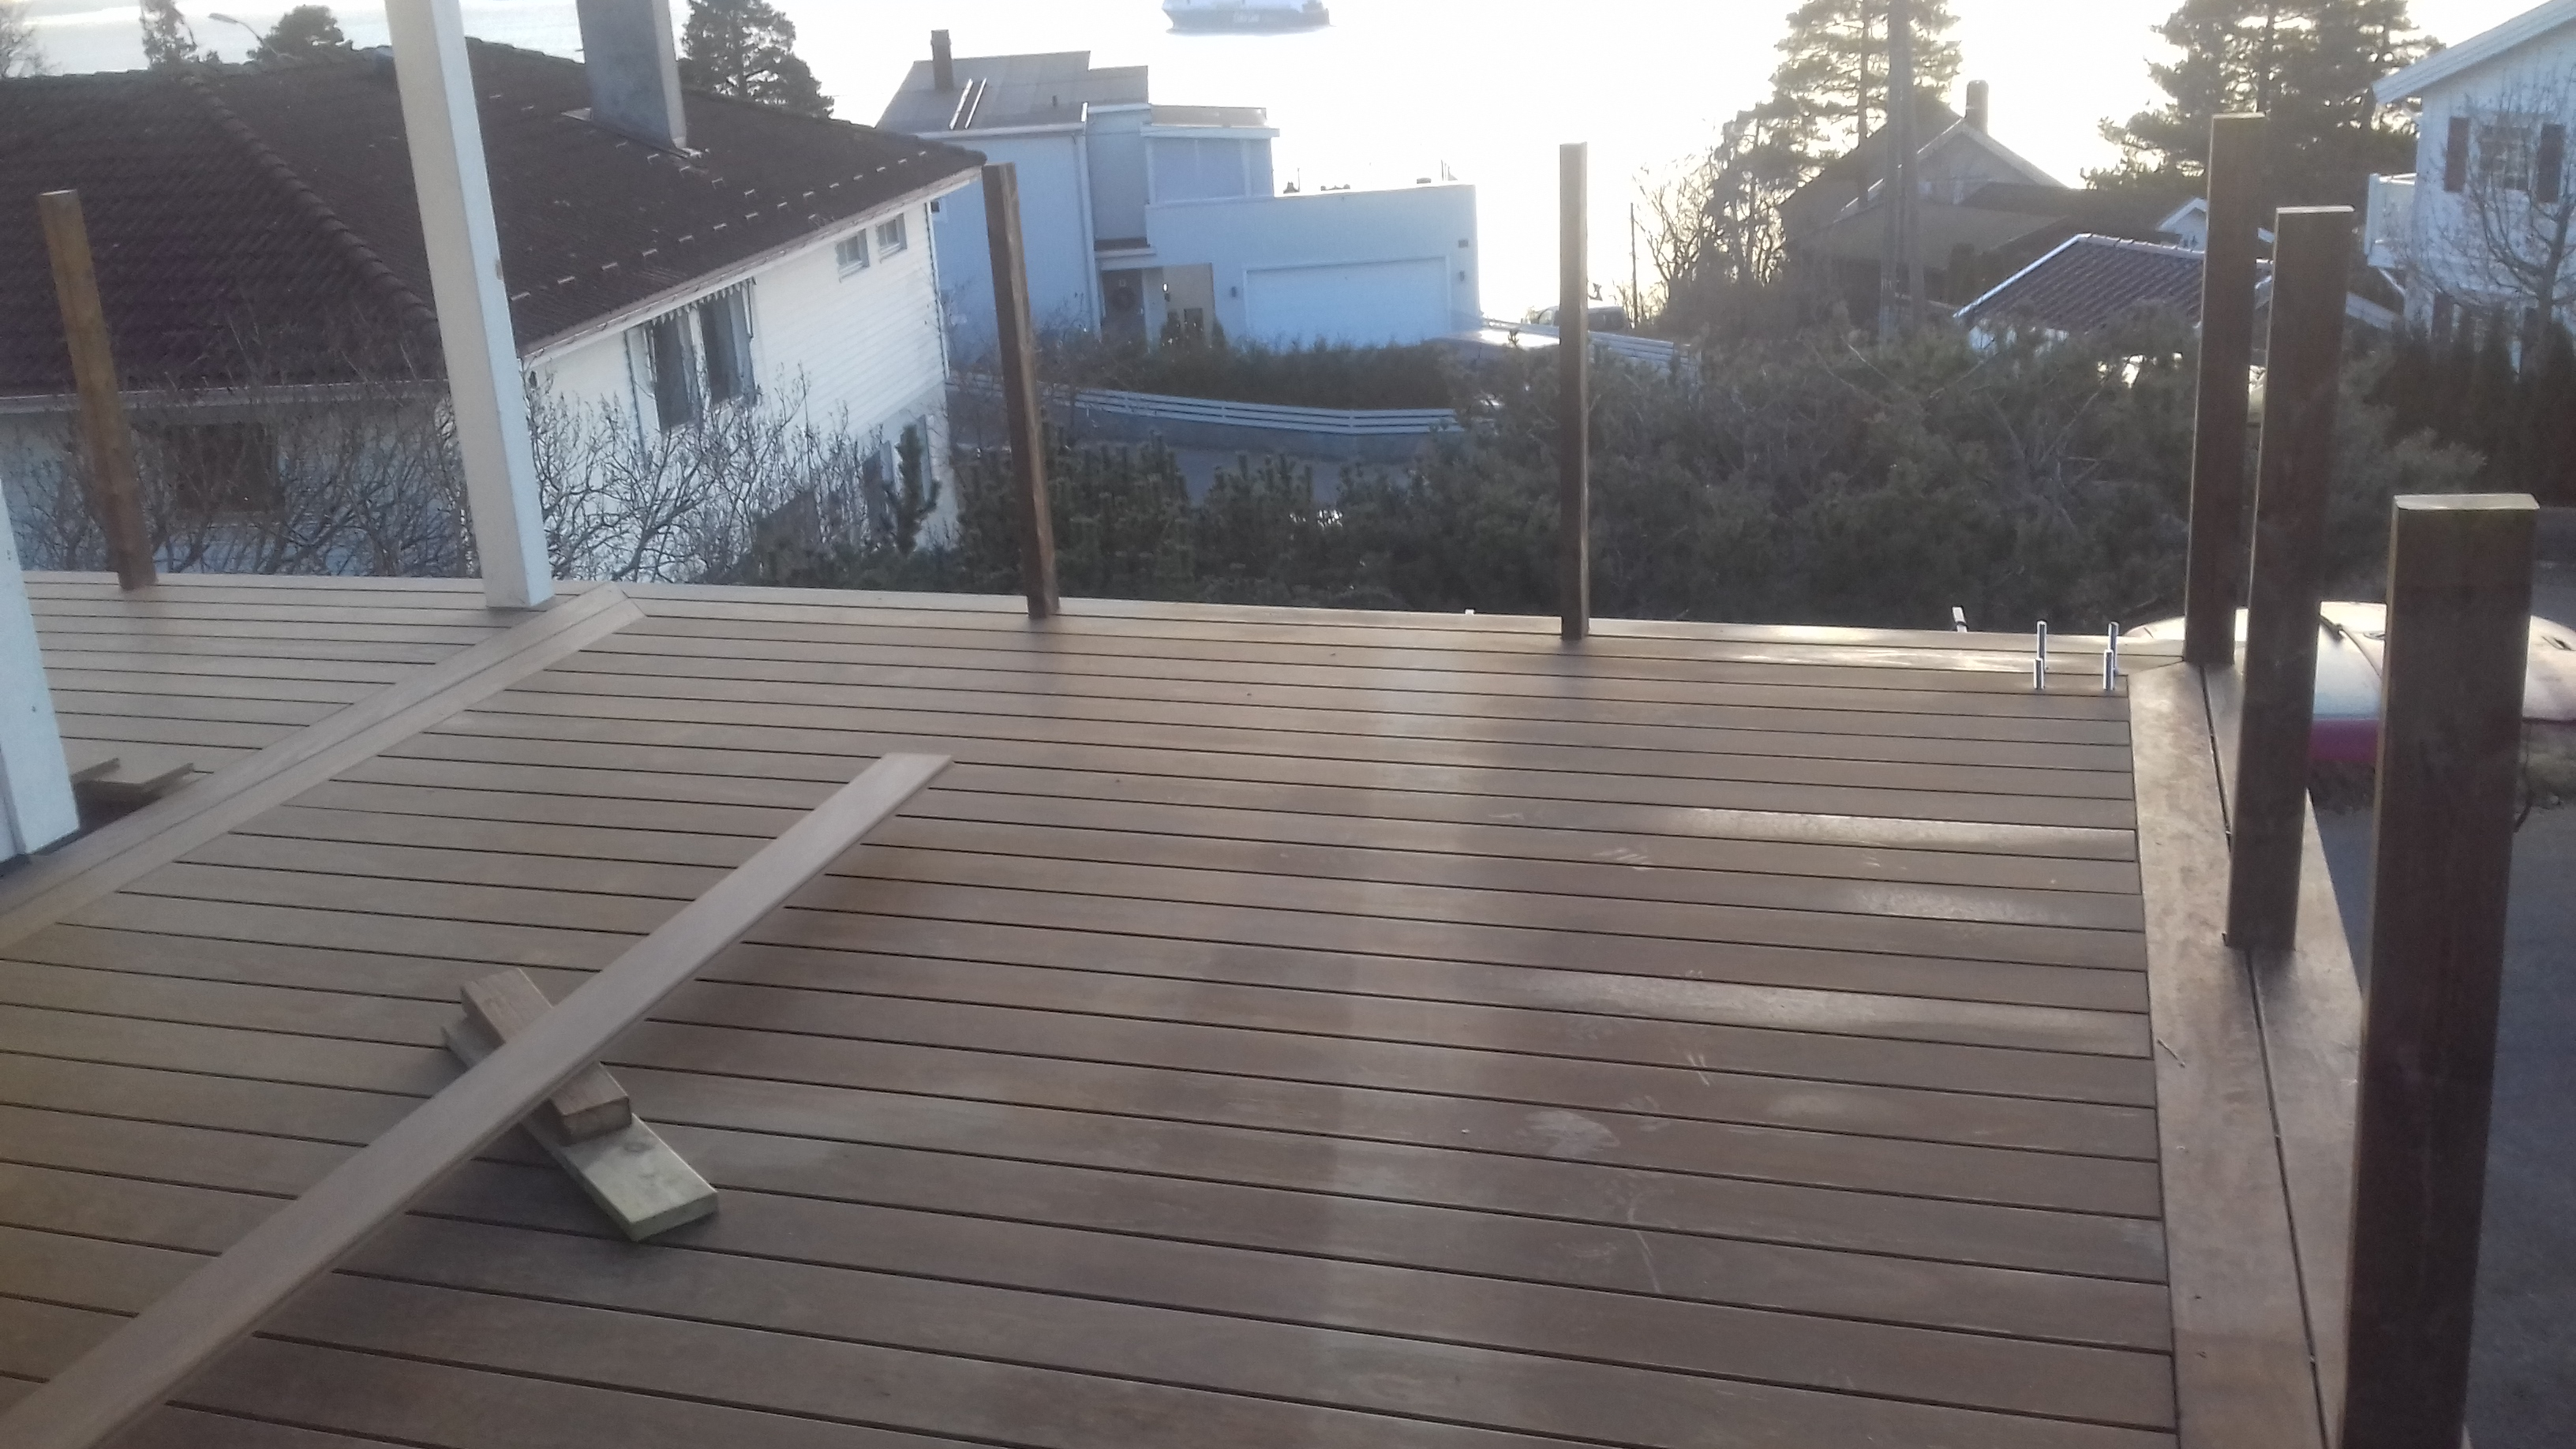 terrasse i Kebony med asfaltmembran